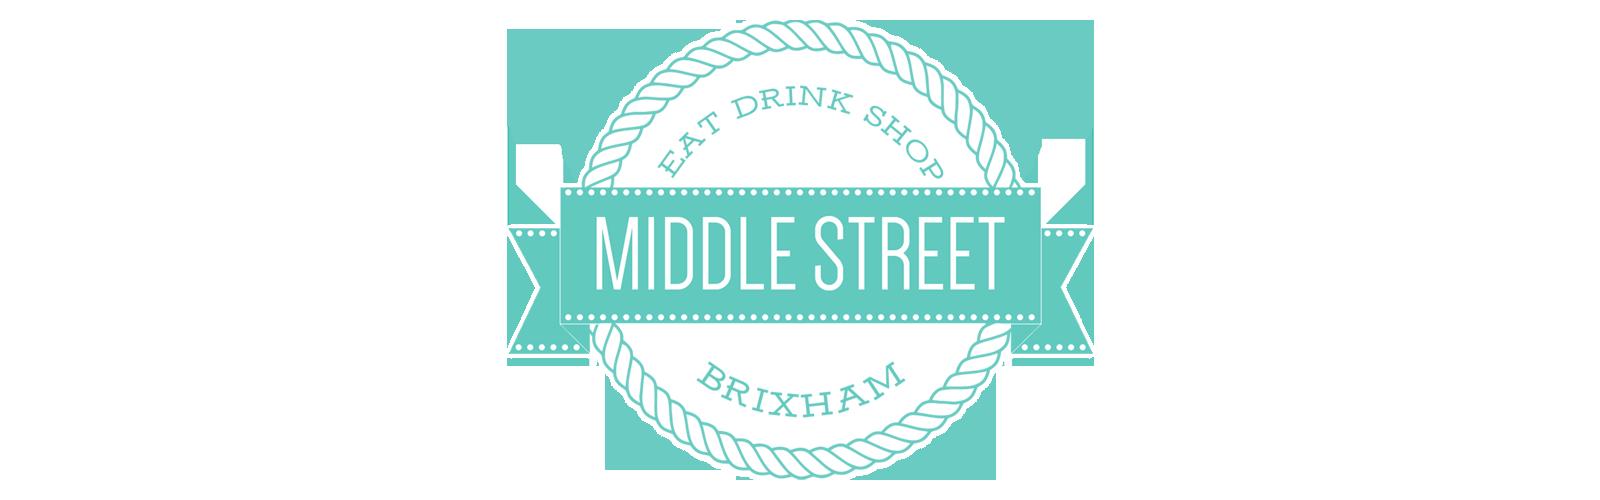 middle street banner logo